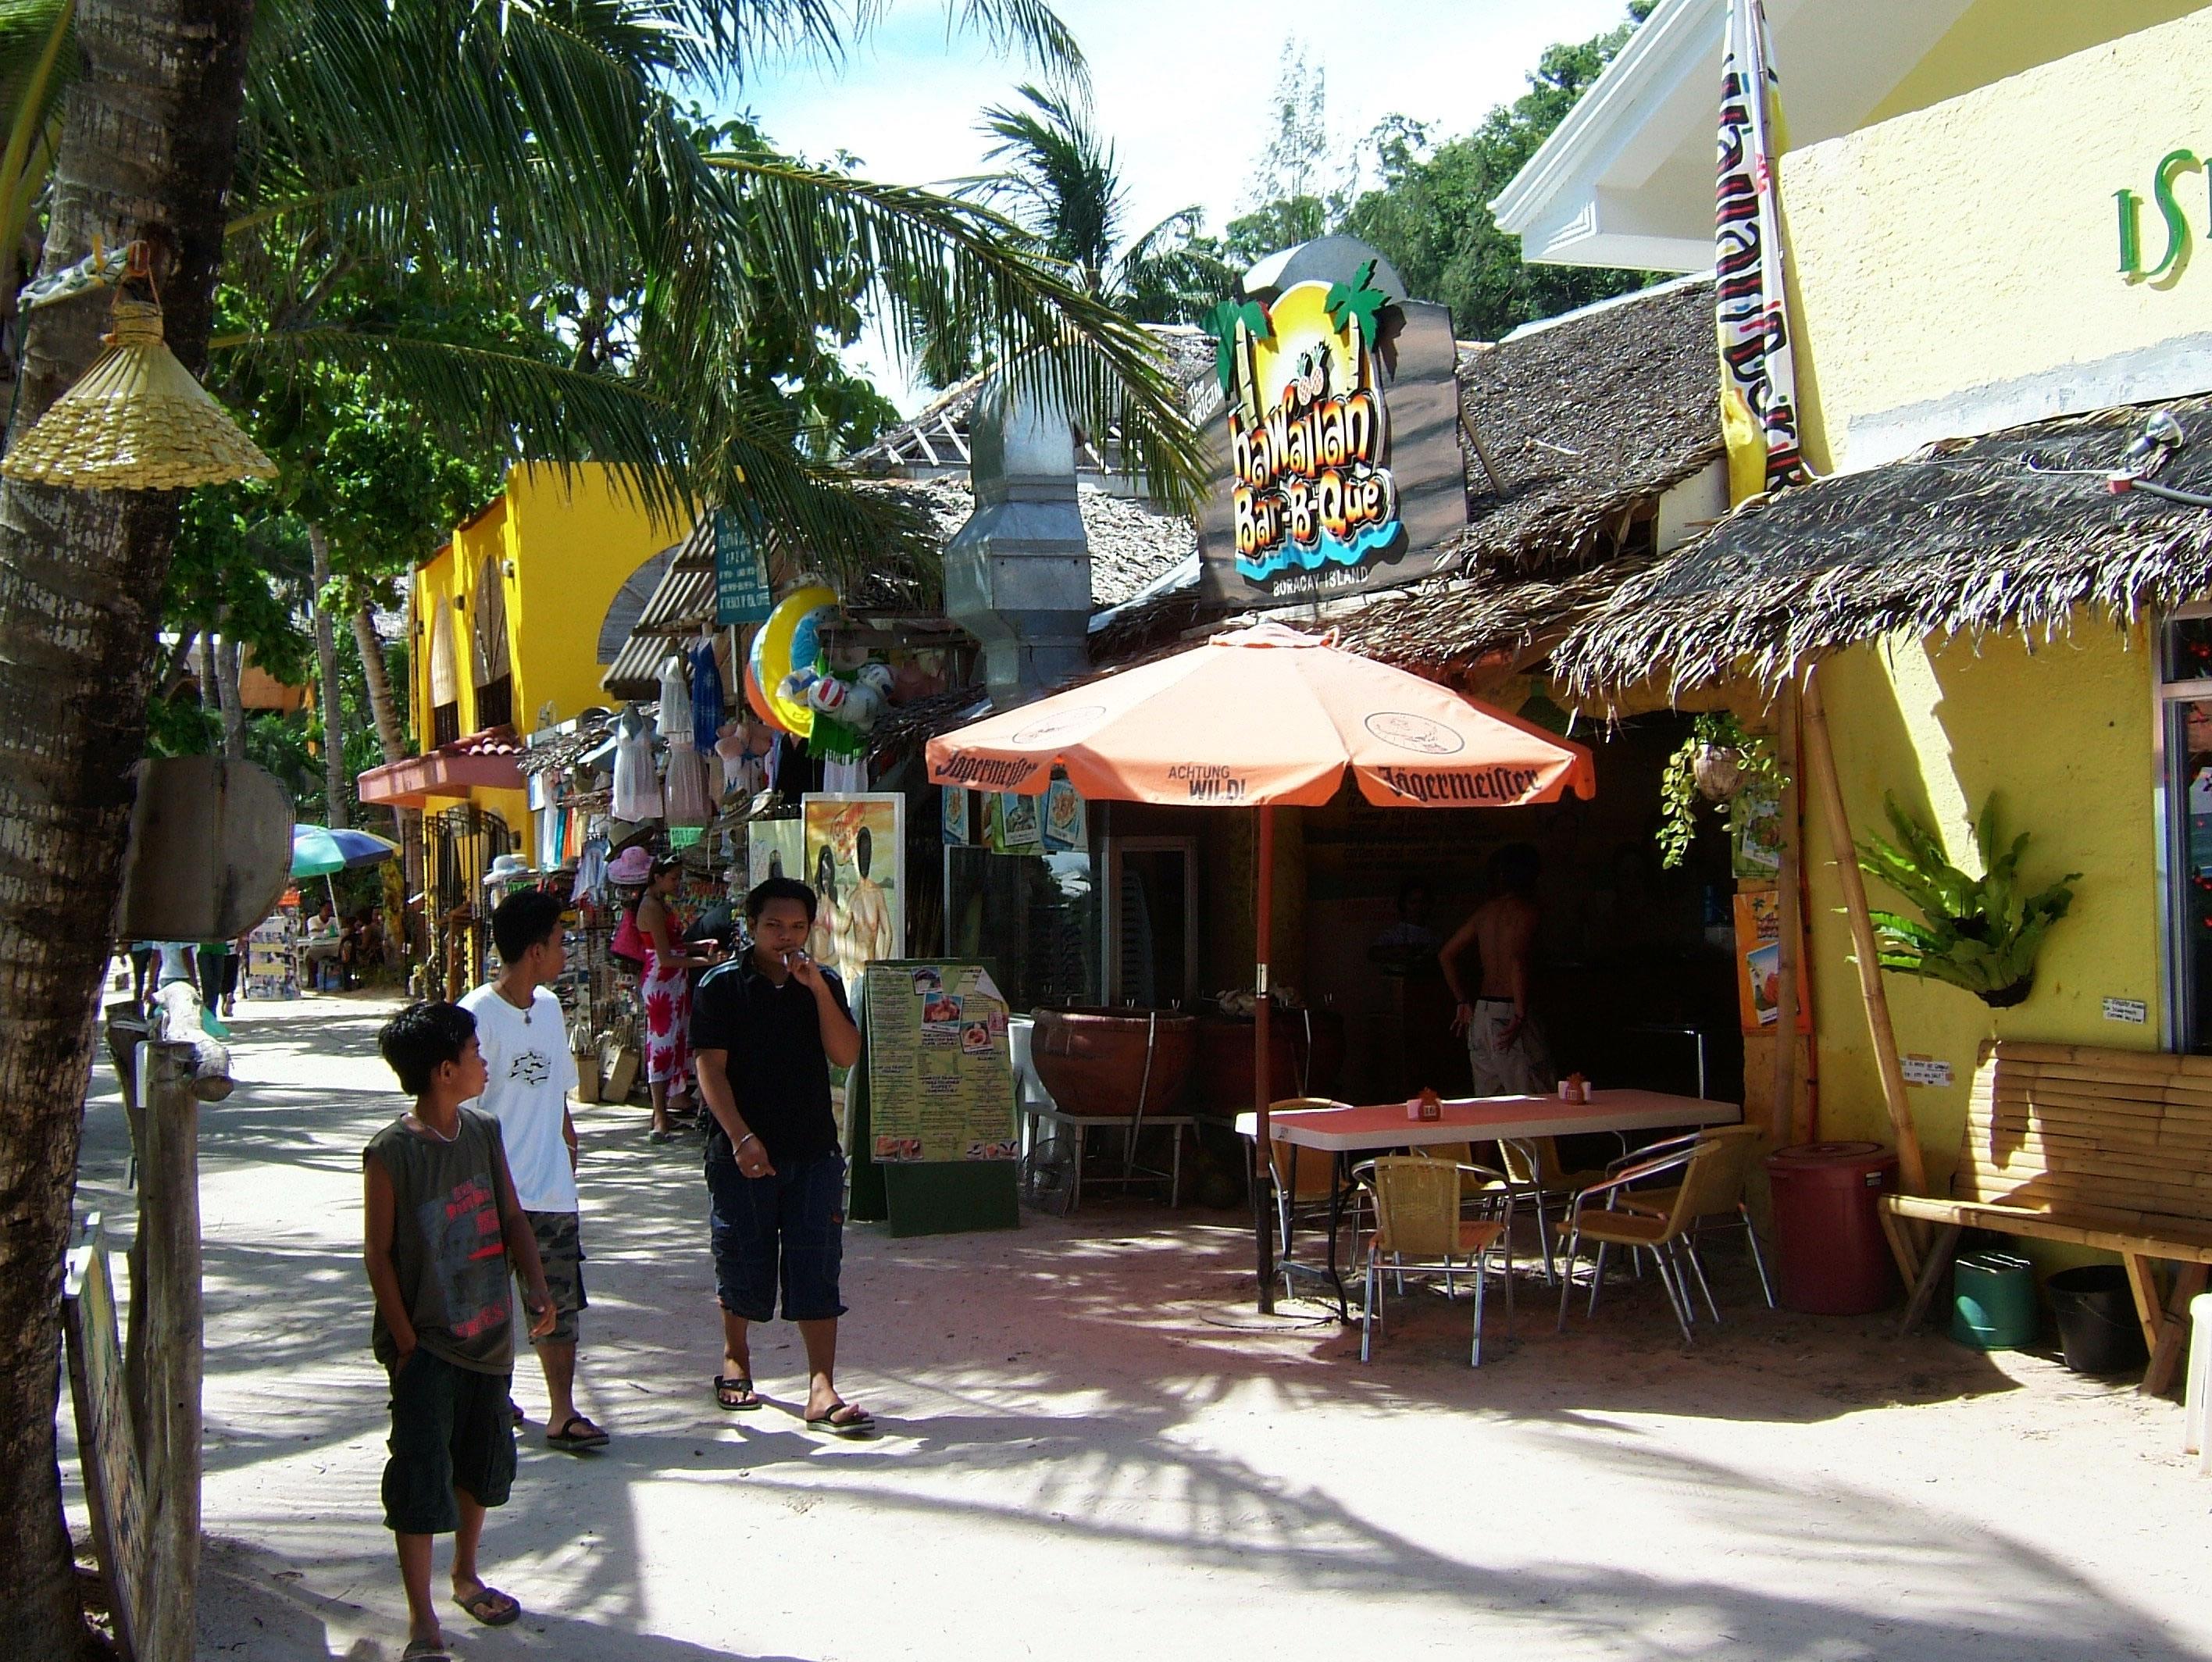 Philippines Sugar Islands Caticlan Boracay White Beach Shops and Bars 2007 02